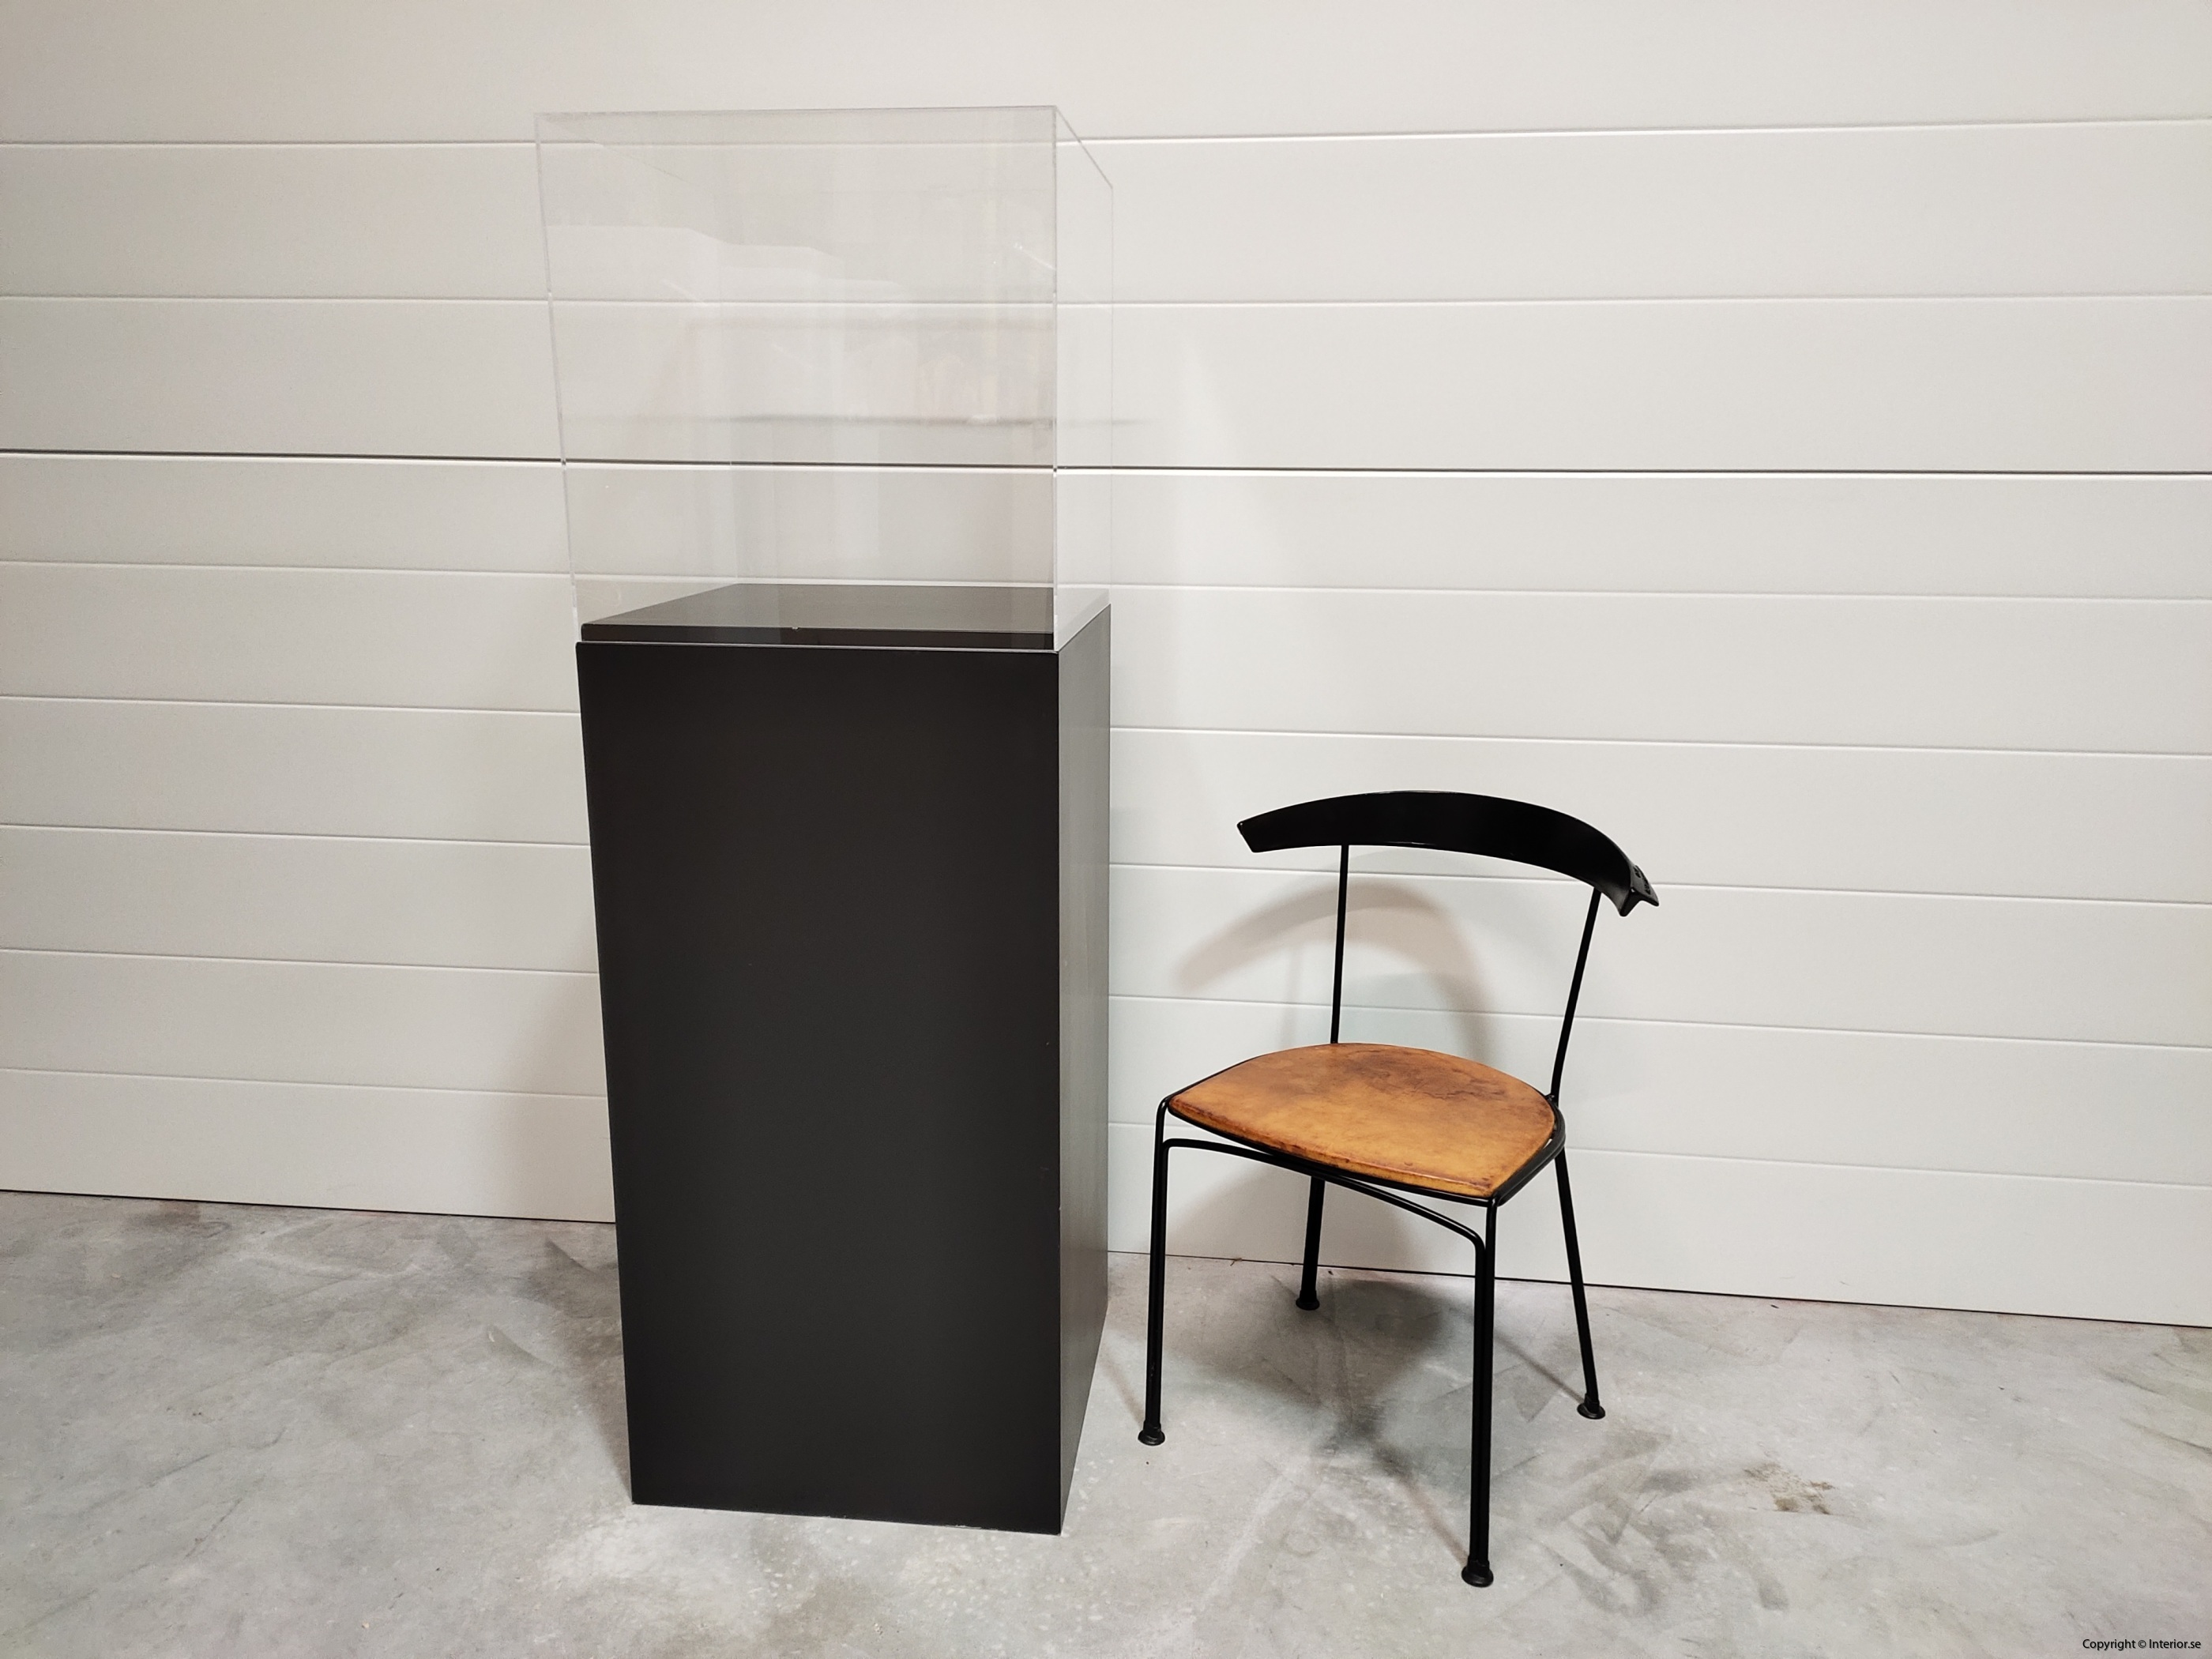 Utställningsmonter  Piedestal - 152 cm hyra monter stockholm (7)